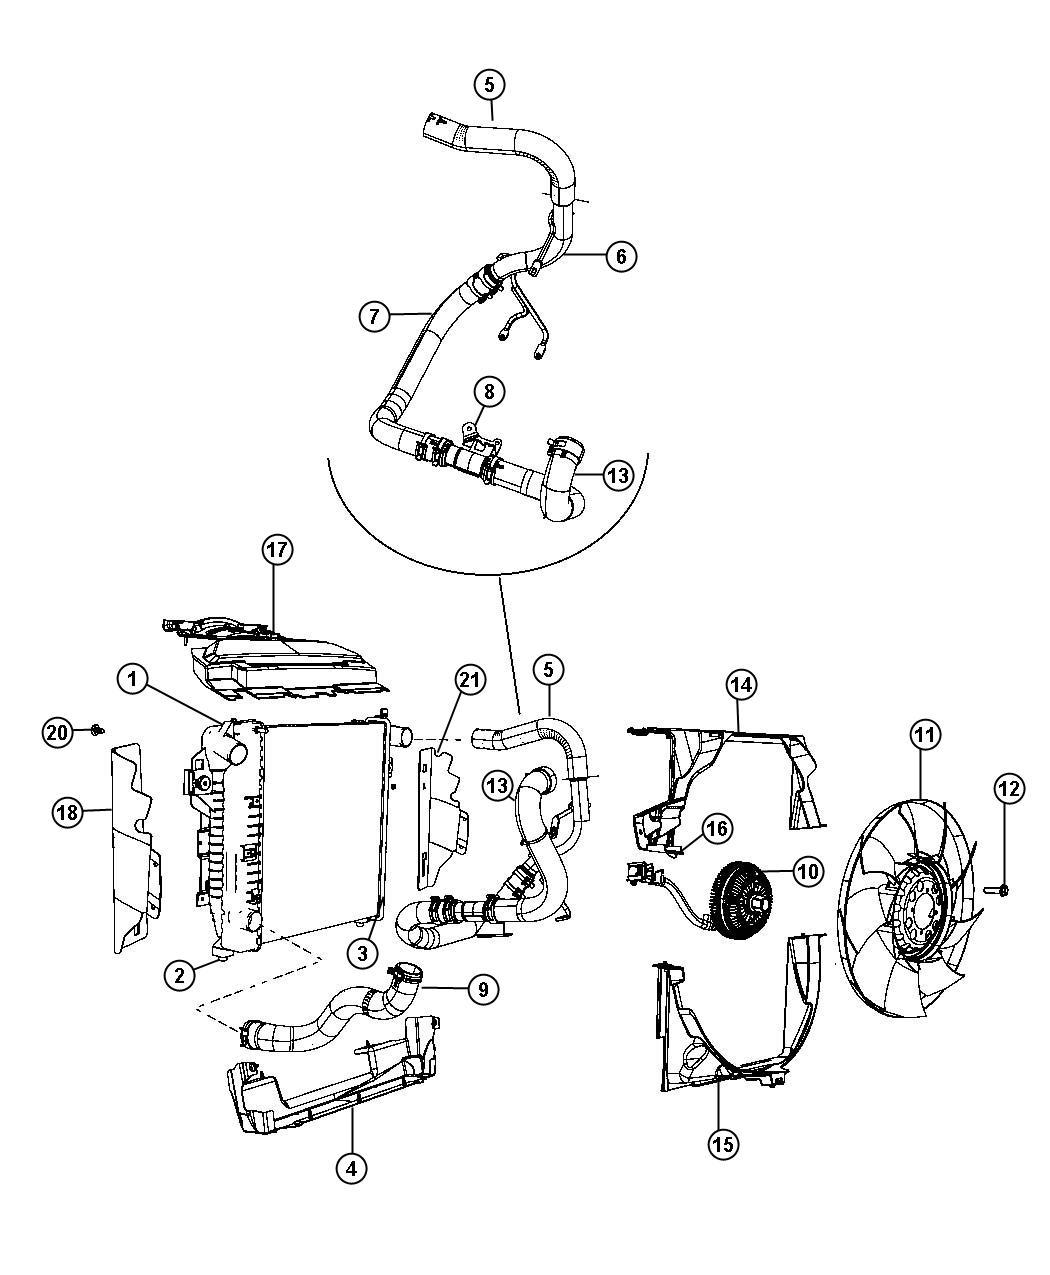 Chrysler Crossfire Bolt, screw. Mounting. Hex flange head